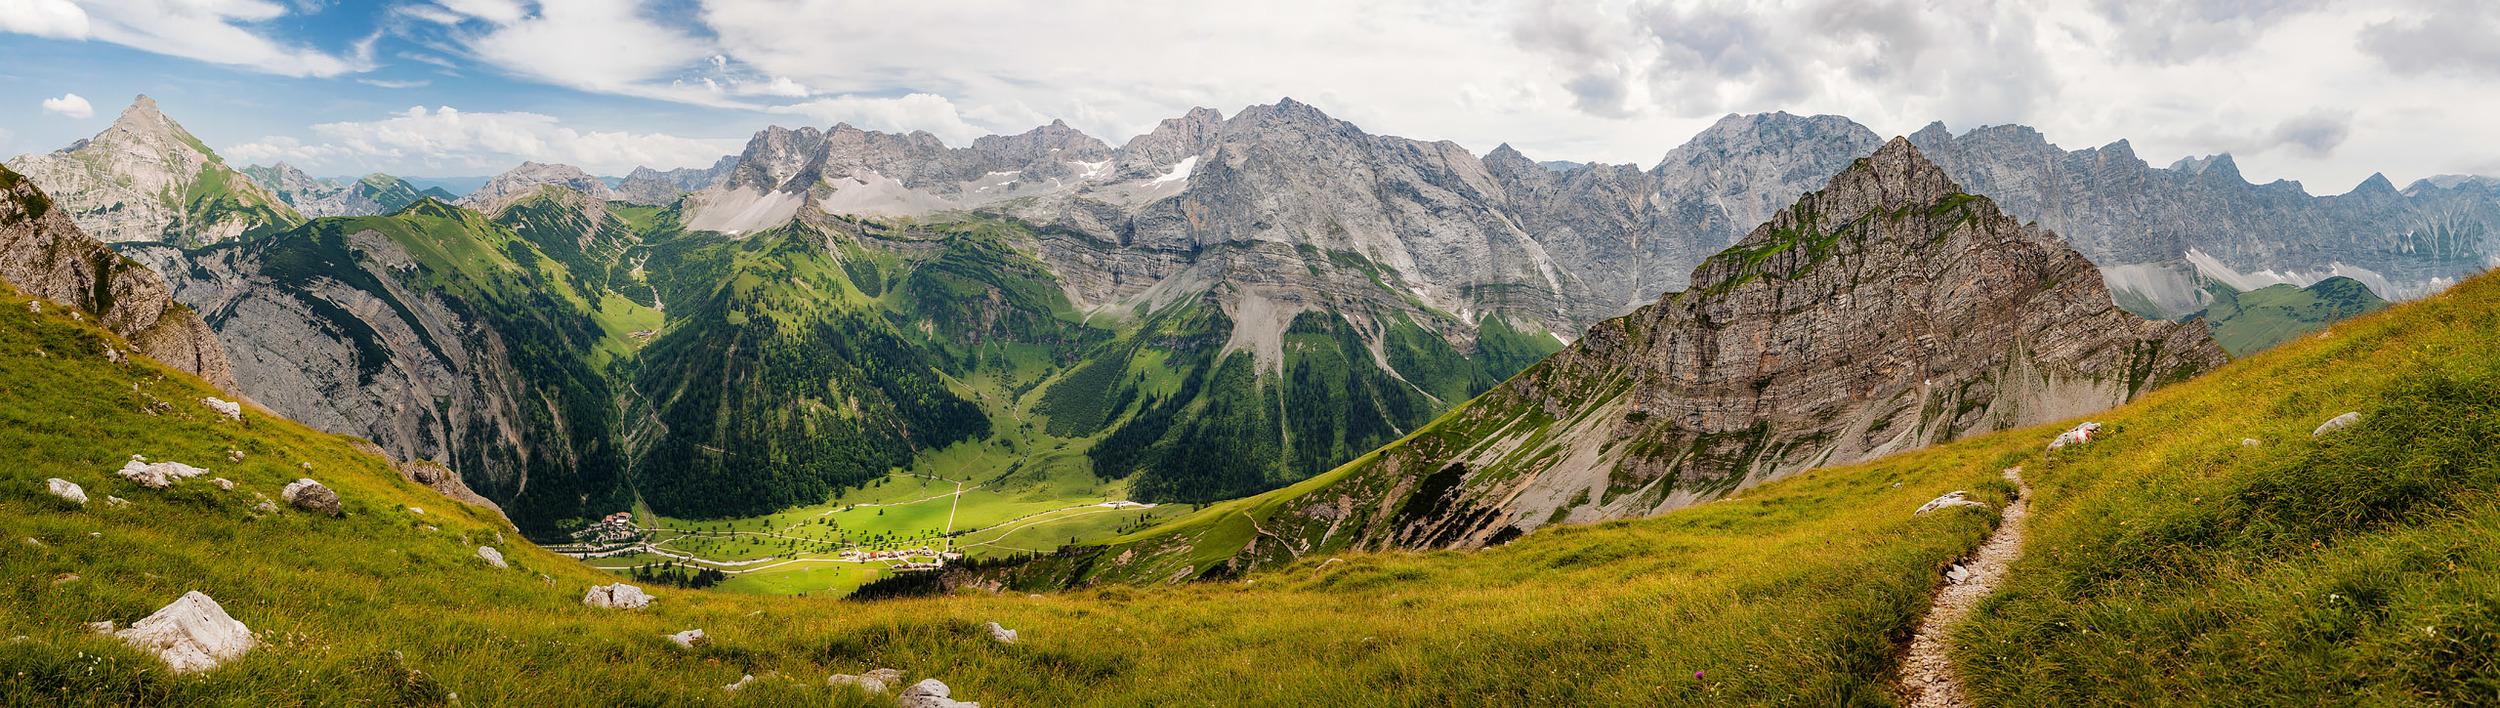 Panorama_2500m_Gamsjoch__BlickAufGumpenspitze_B.jpg